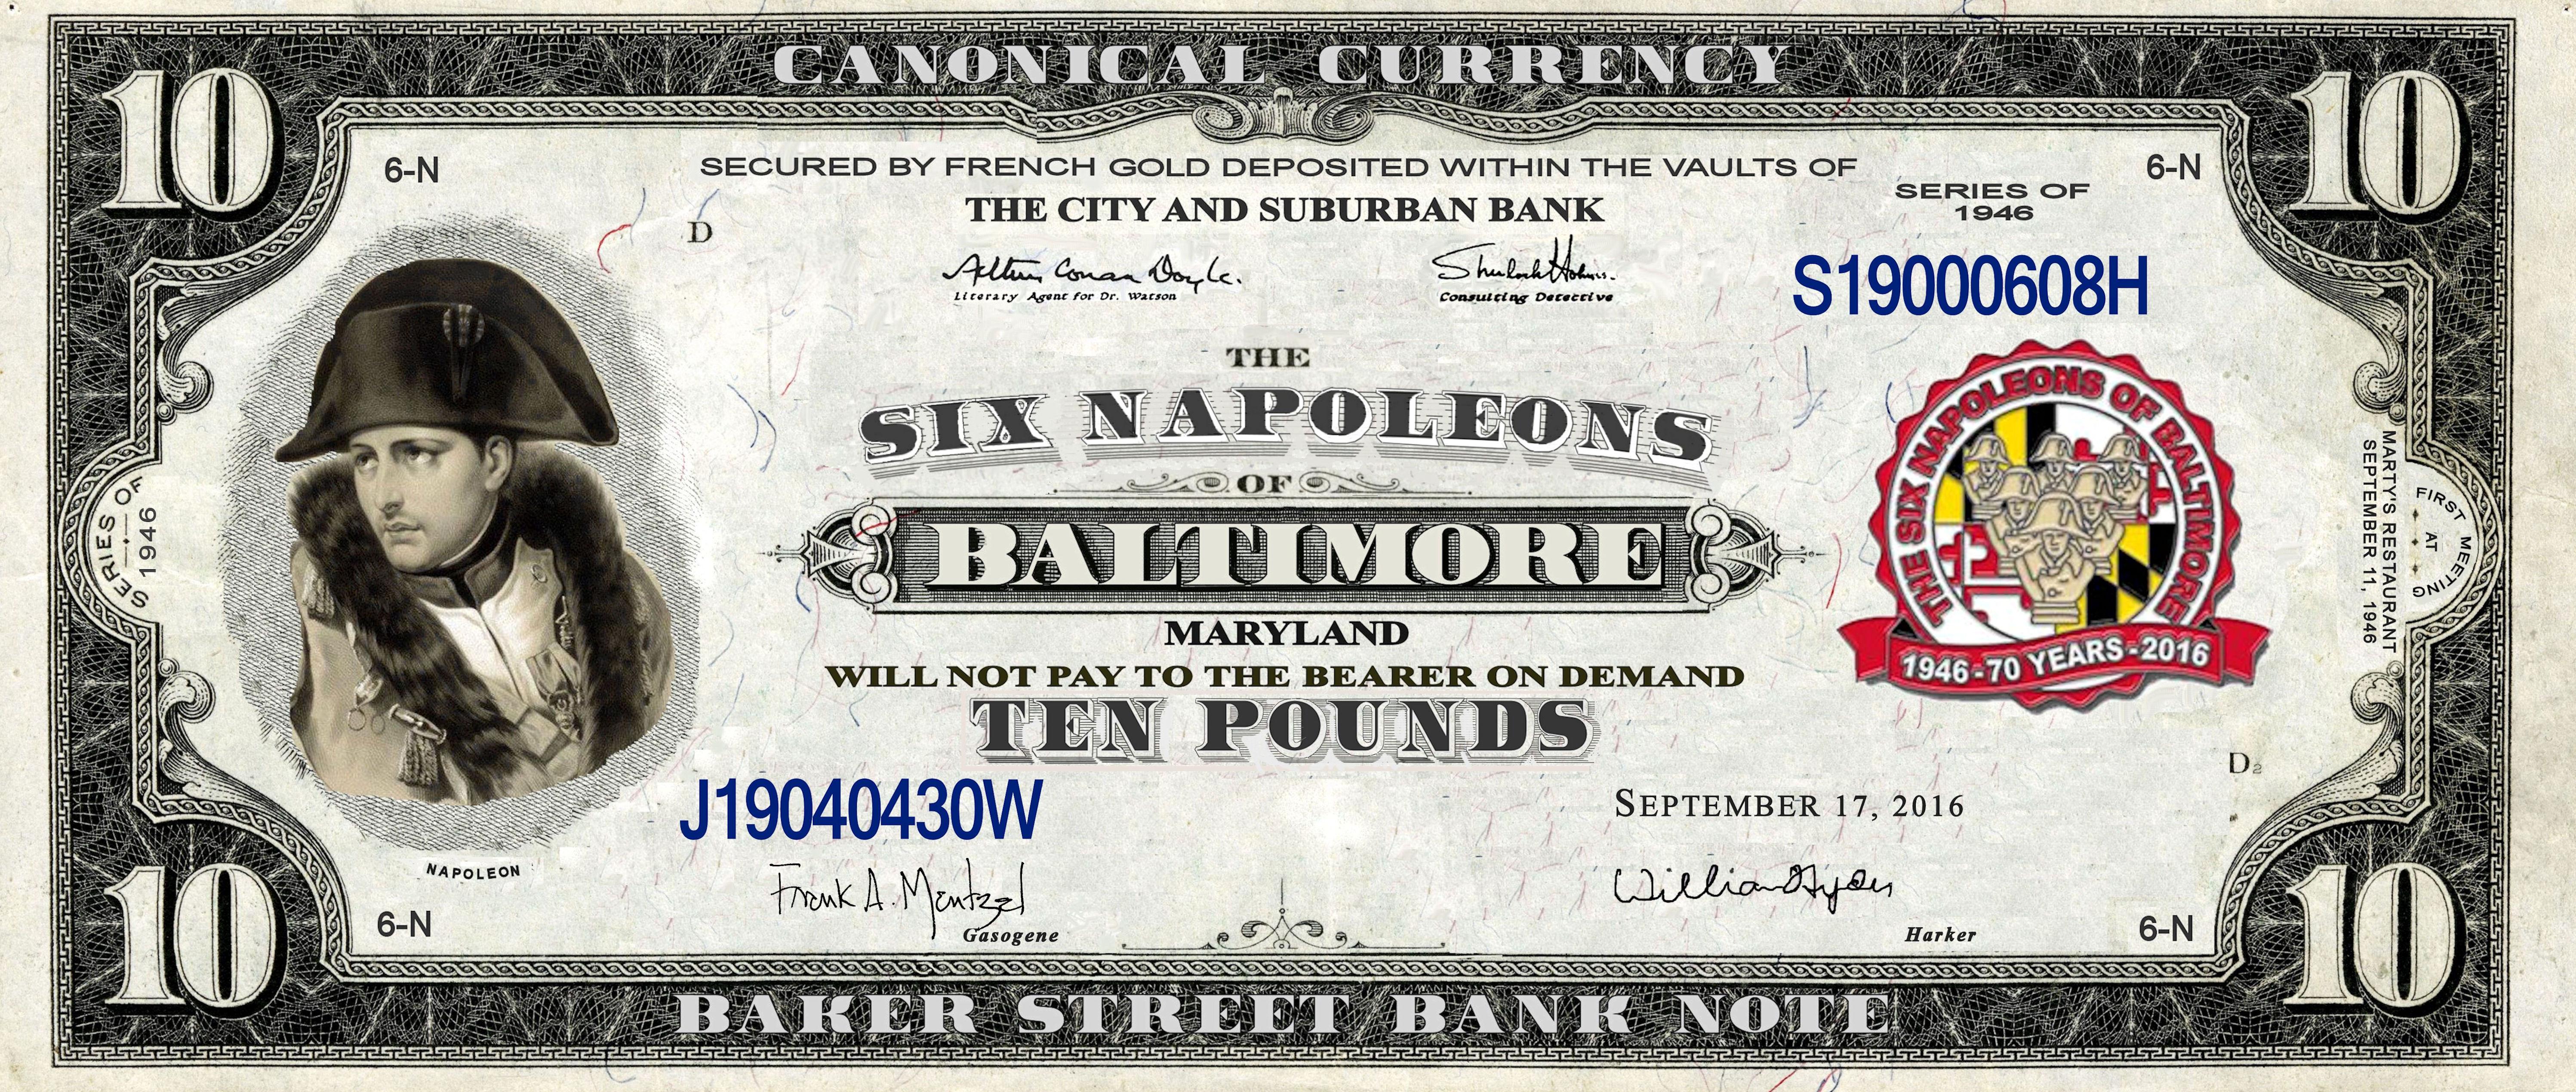 Baltimore's Six Napoleons 70th Anniversary Bank Note